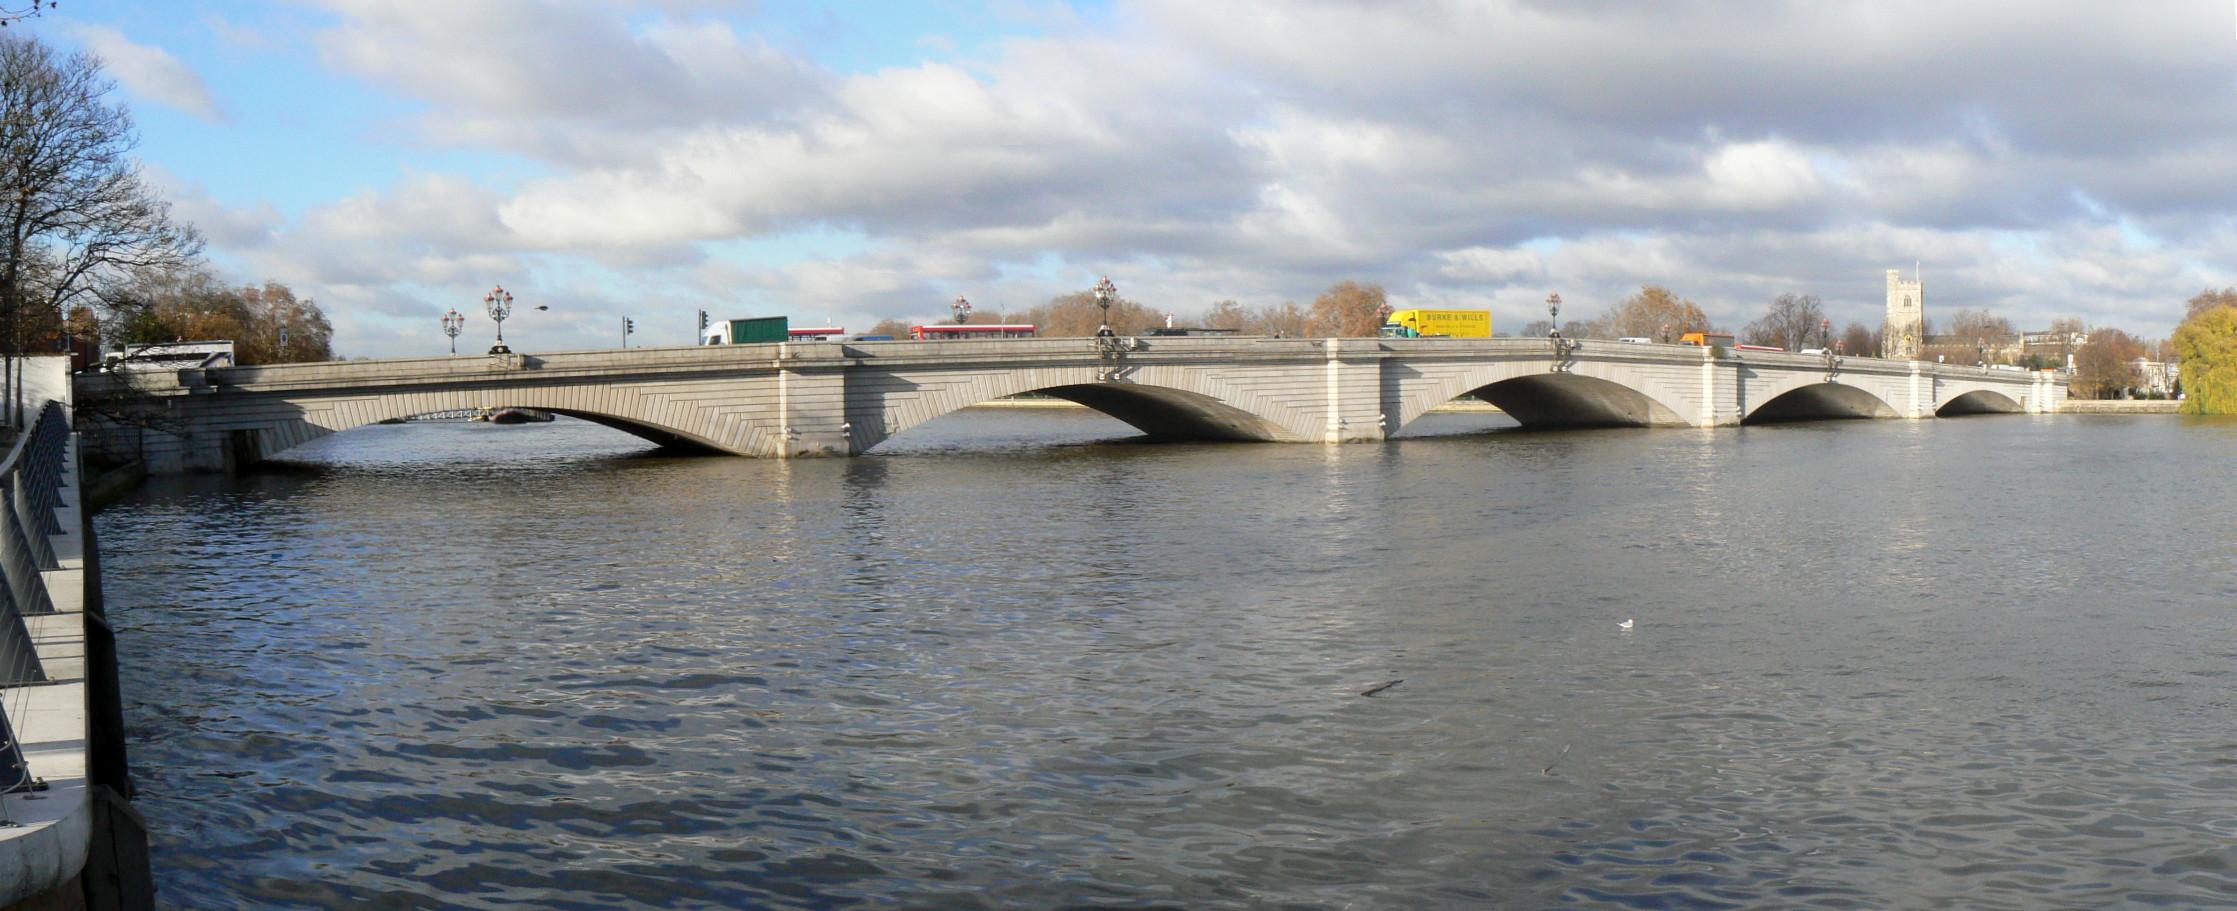 Putney_Bridge_723-5